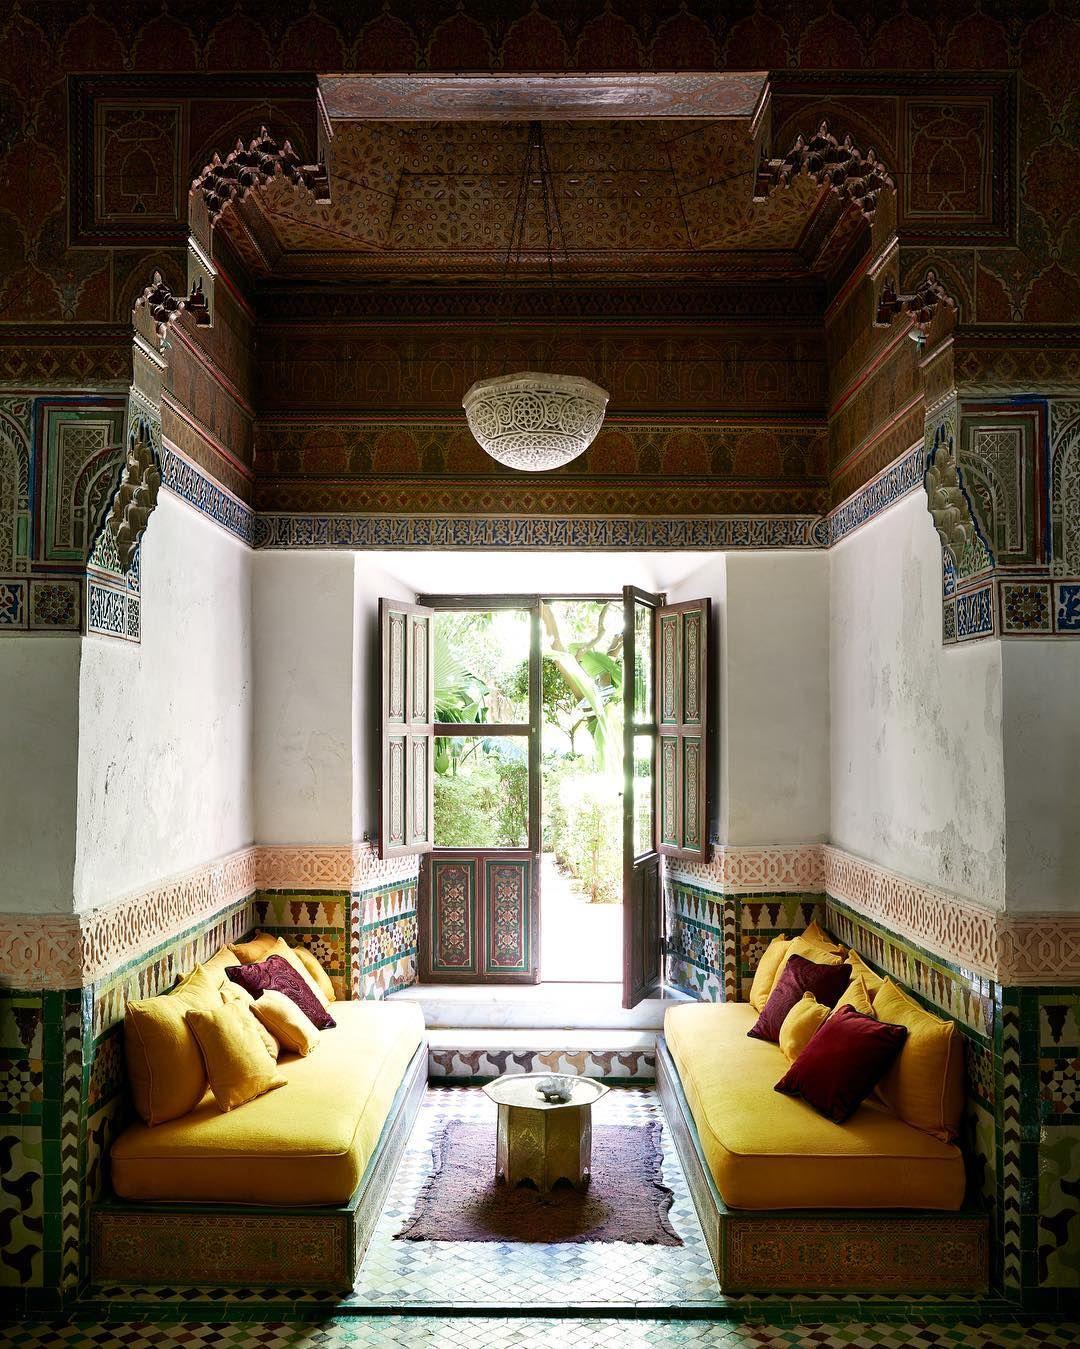 Palais De La Zahia Marrakech Morocco Lampade Lanterne